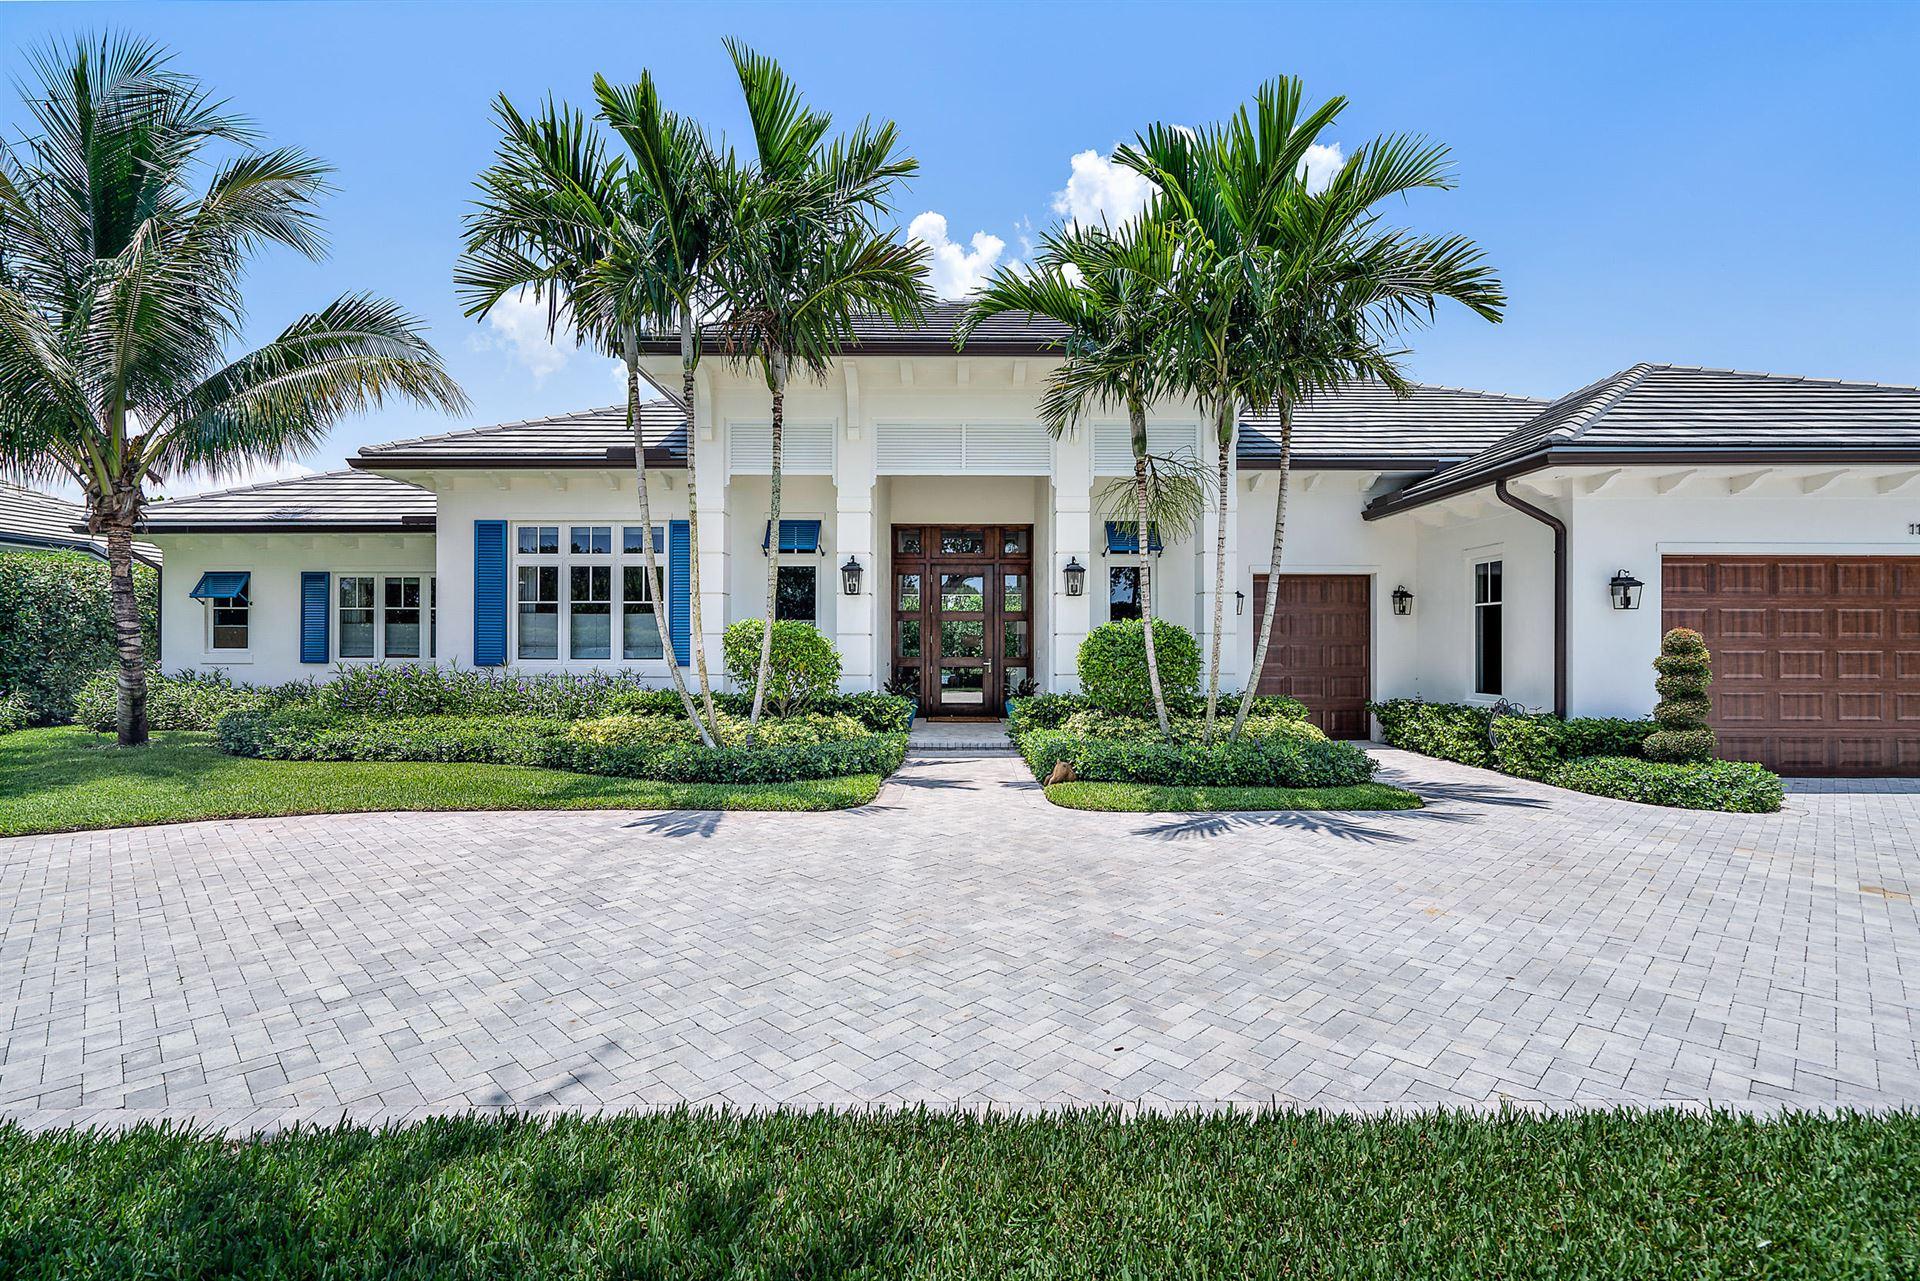 Photo of 118 Golf Village Boulevard, Jupiter, FL 33458 (MLS # RX-10626400)